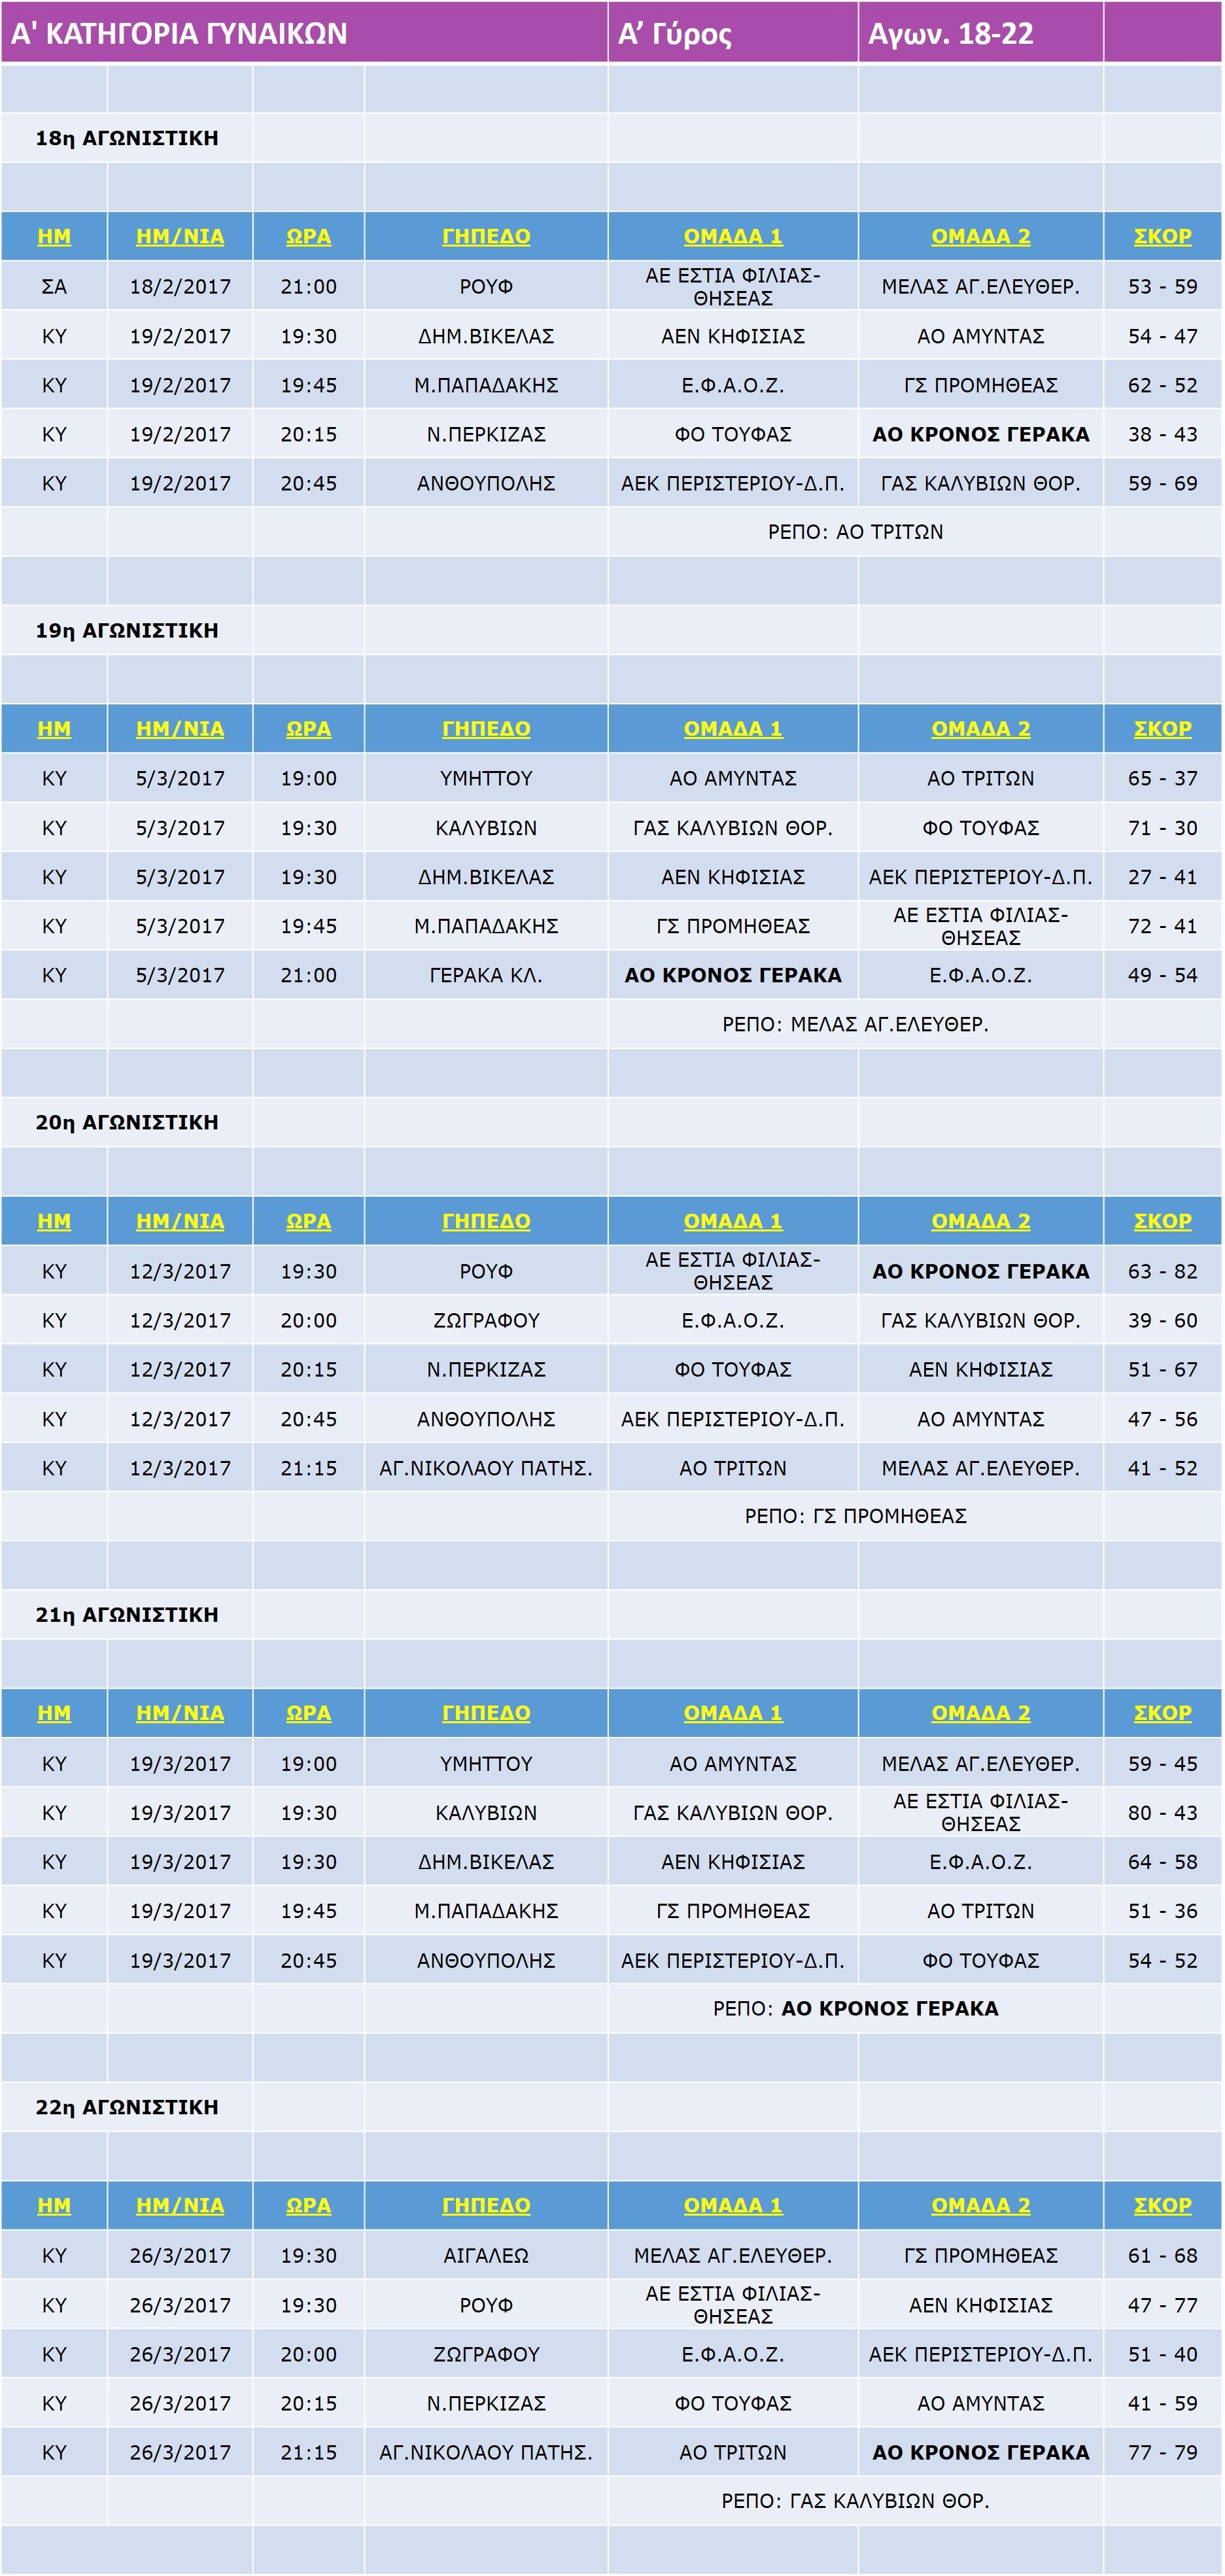 Gynaikes_Match_18-22_22